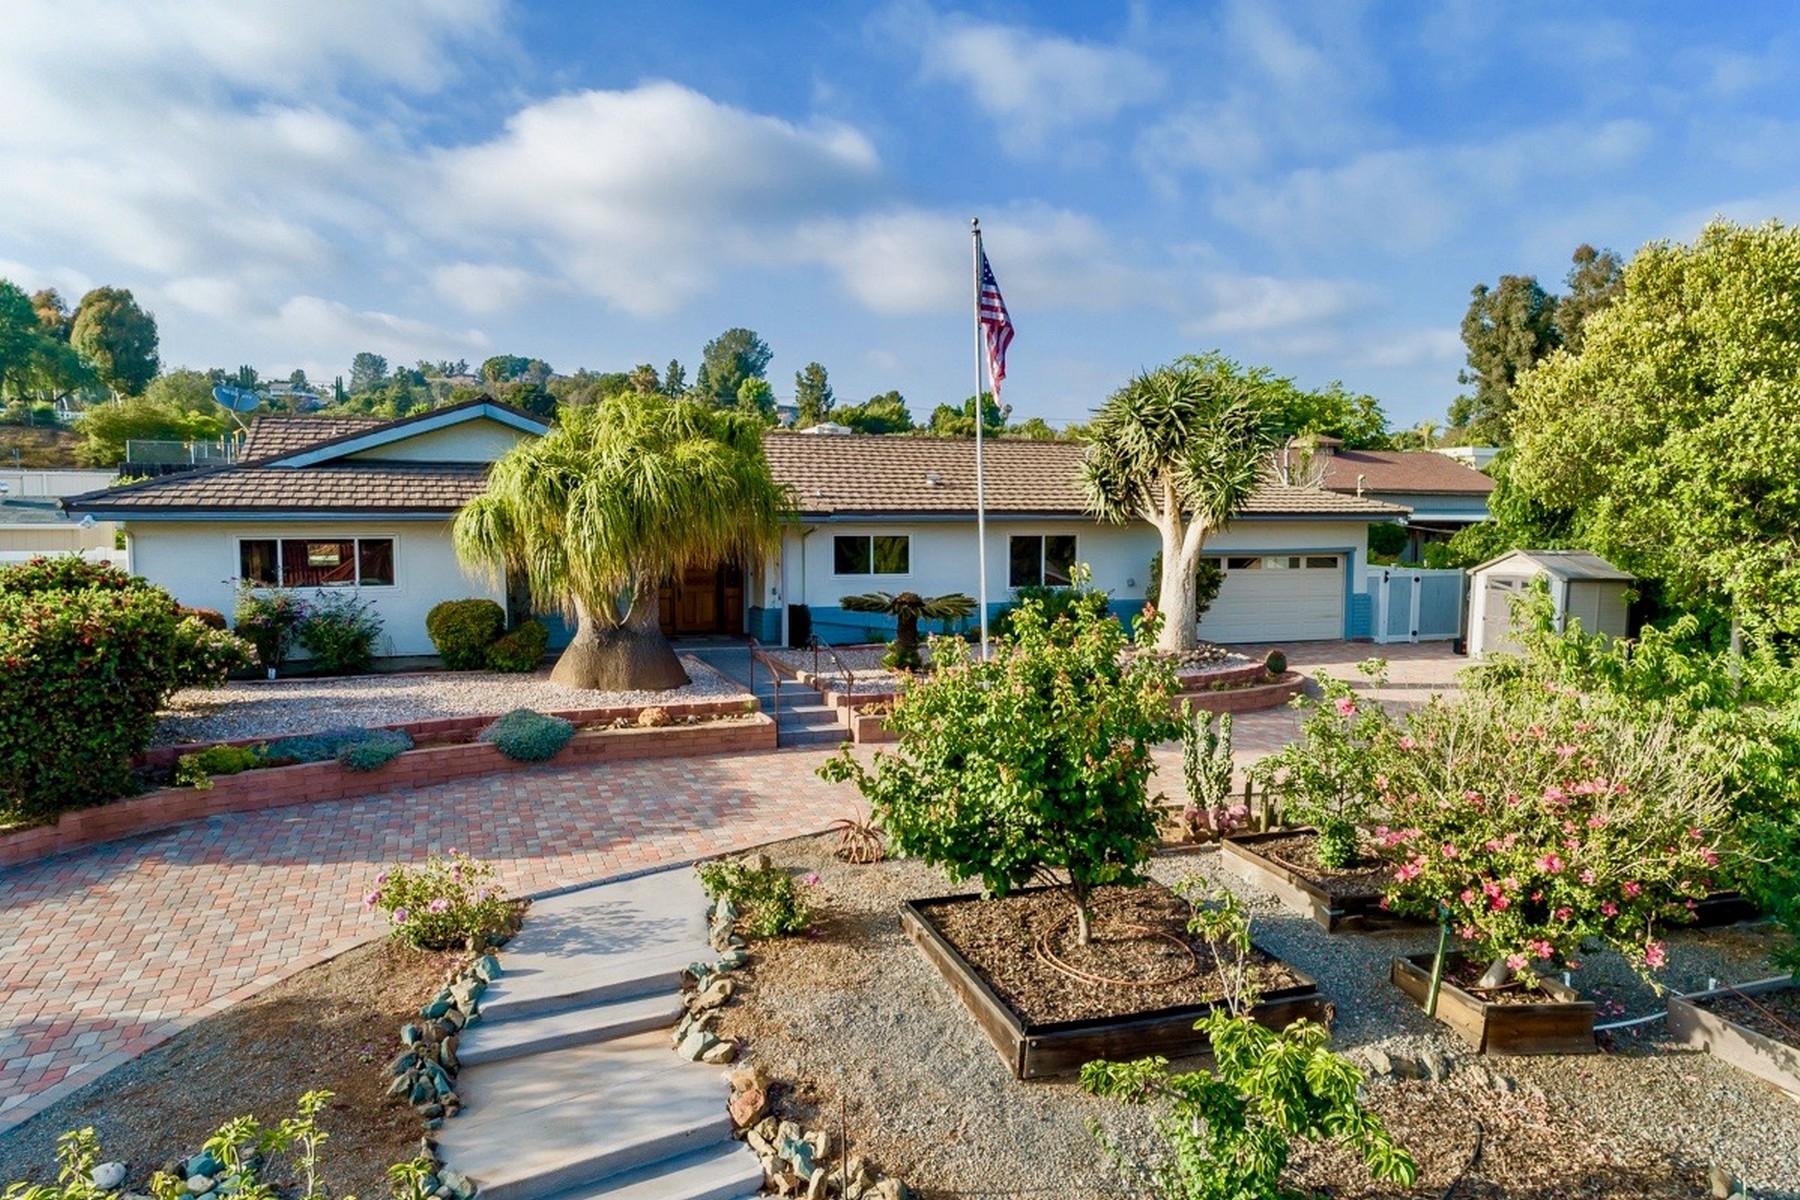 Single Family Homes for Sale at 11472 Fuerte Farms Rd El Cajon, California 92020 United States